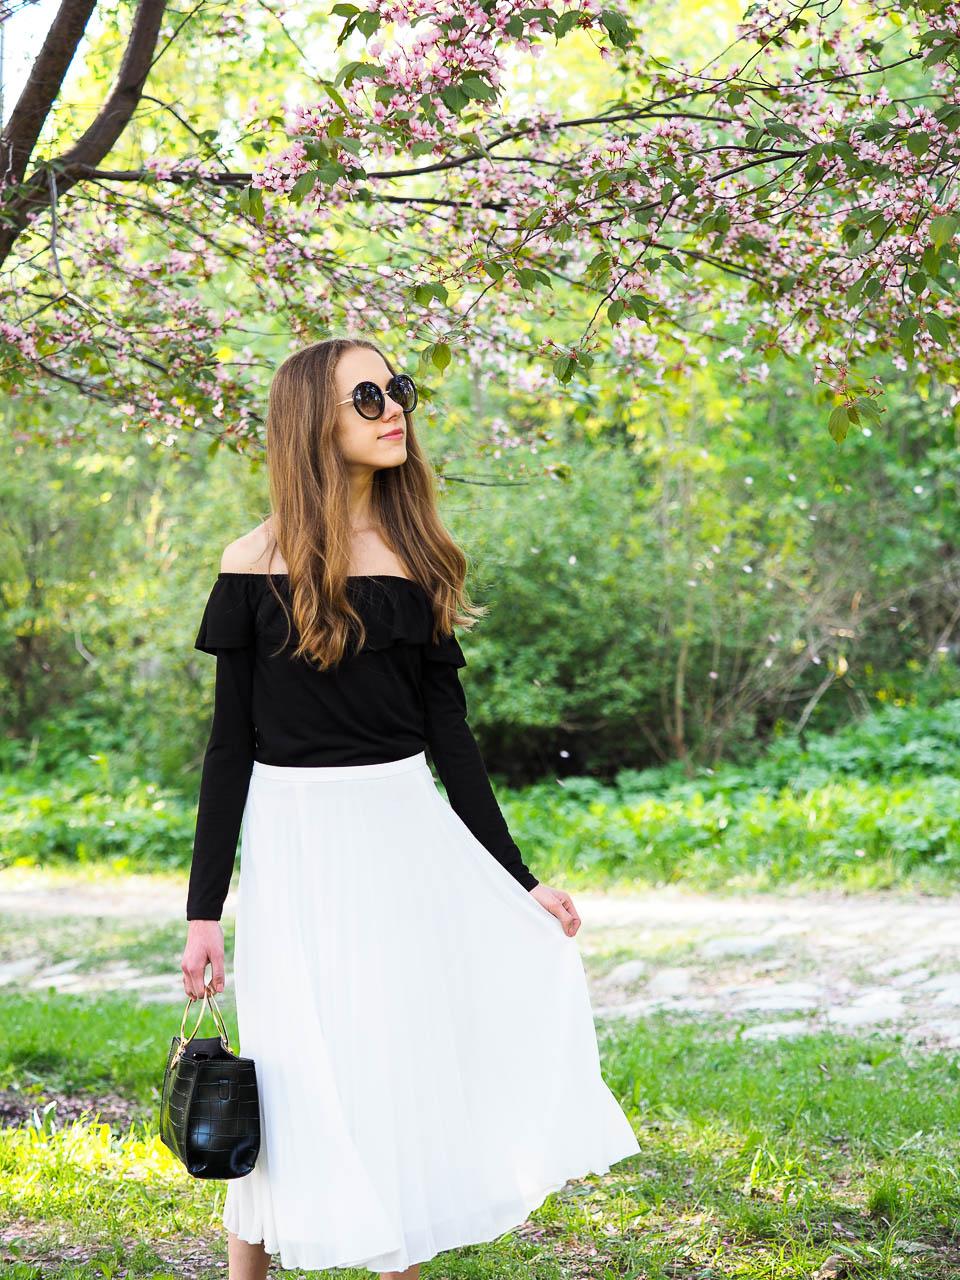 fadhion-blogger-summer-style-staples-2018-pleated-midi-skirt